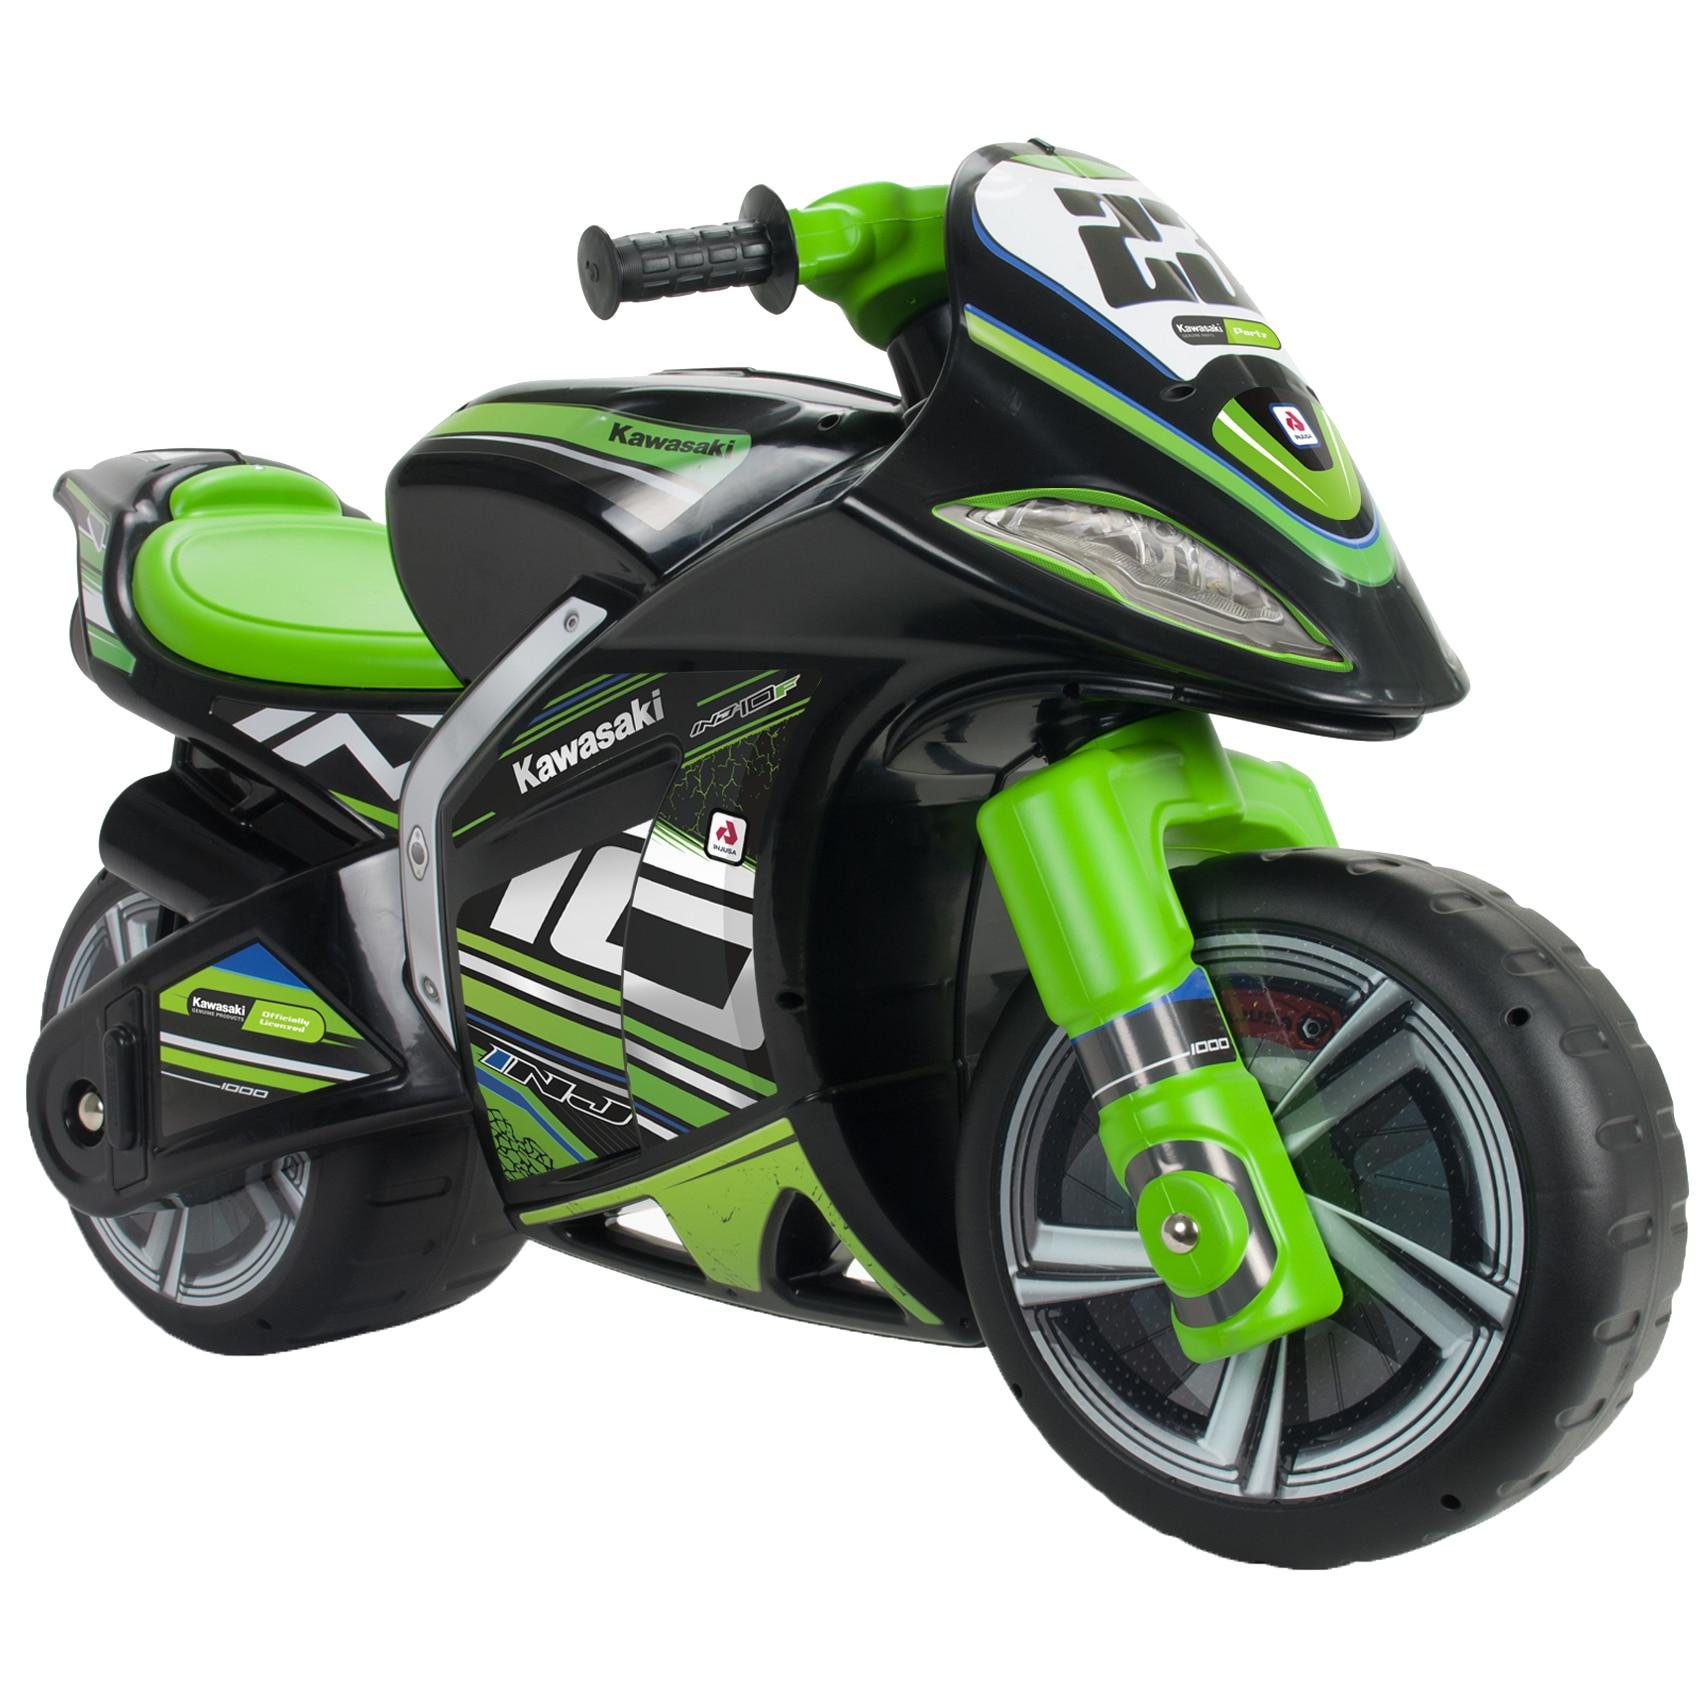 Fotografie Motocicleta Ride-on Injusa - Winner Kawasaki